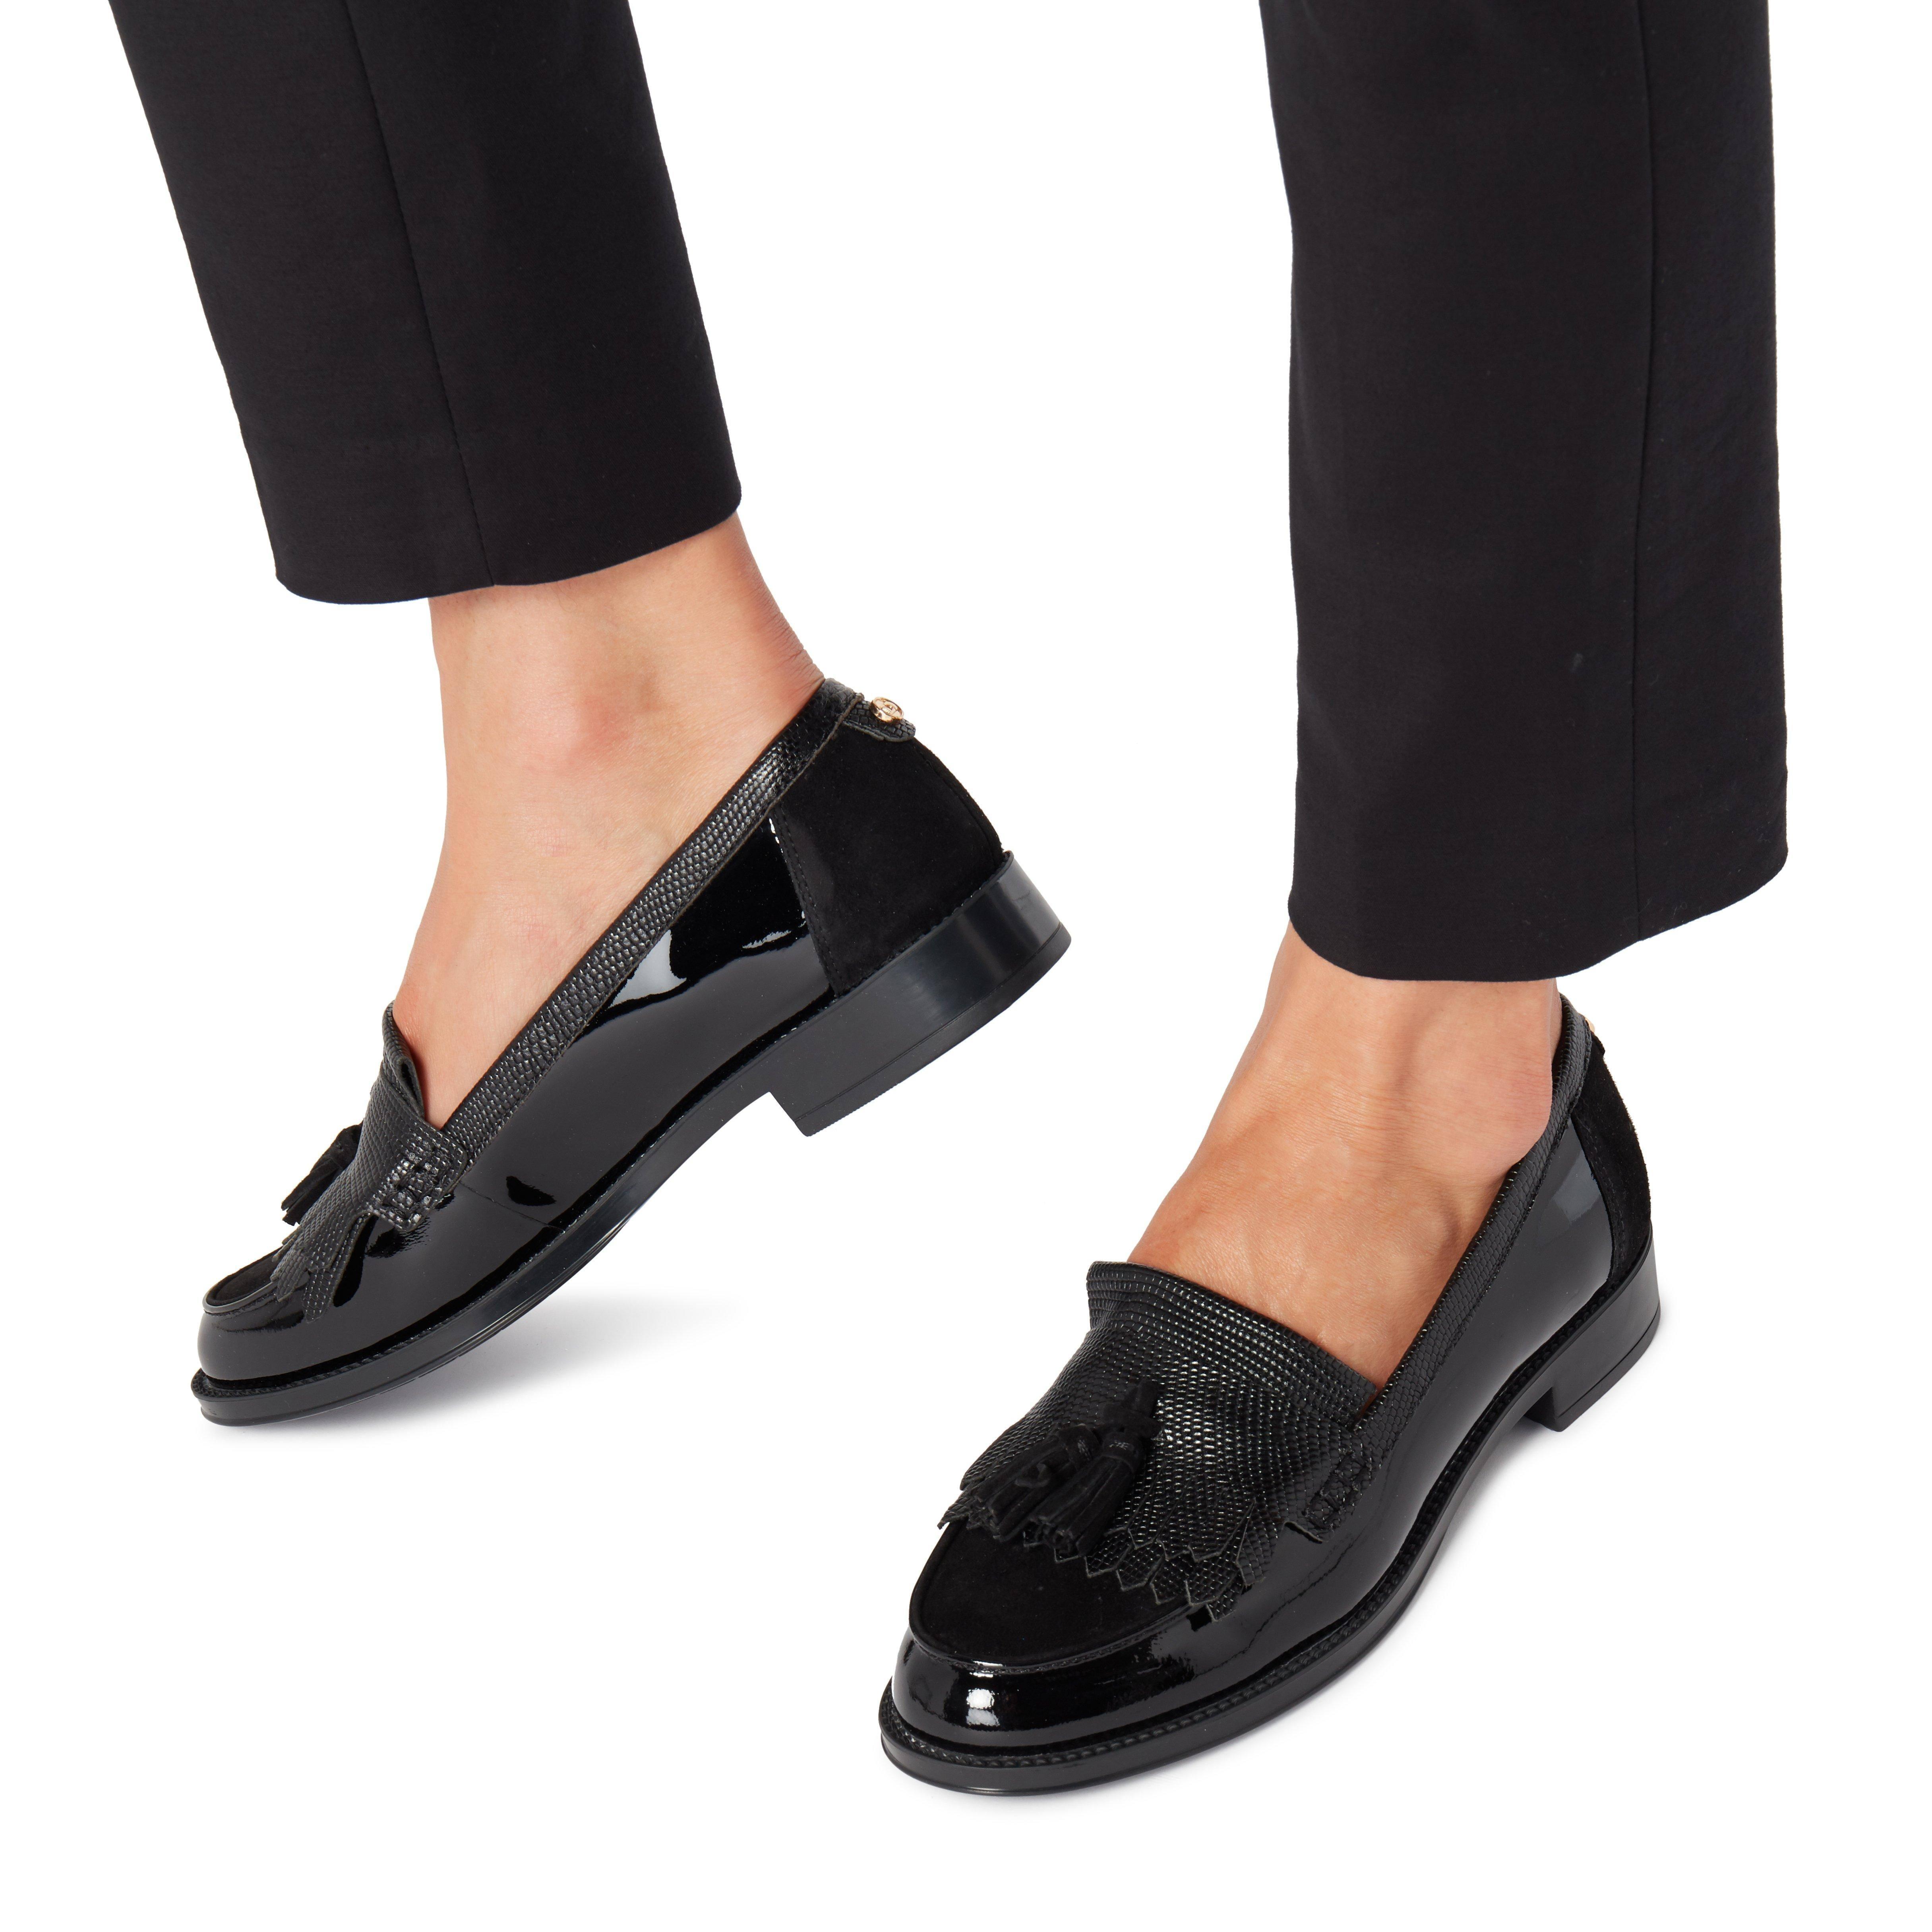 Ladies Tassel Size In 5 Black Greatly Loafer Detail Uk Dune qSpUzGMV